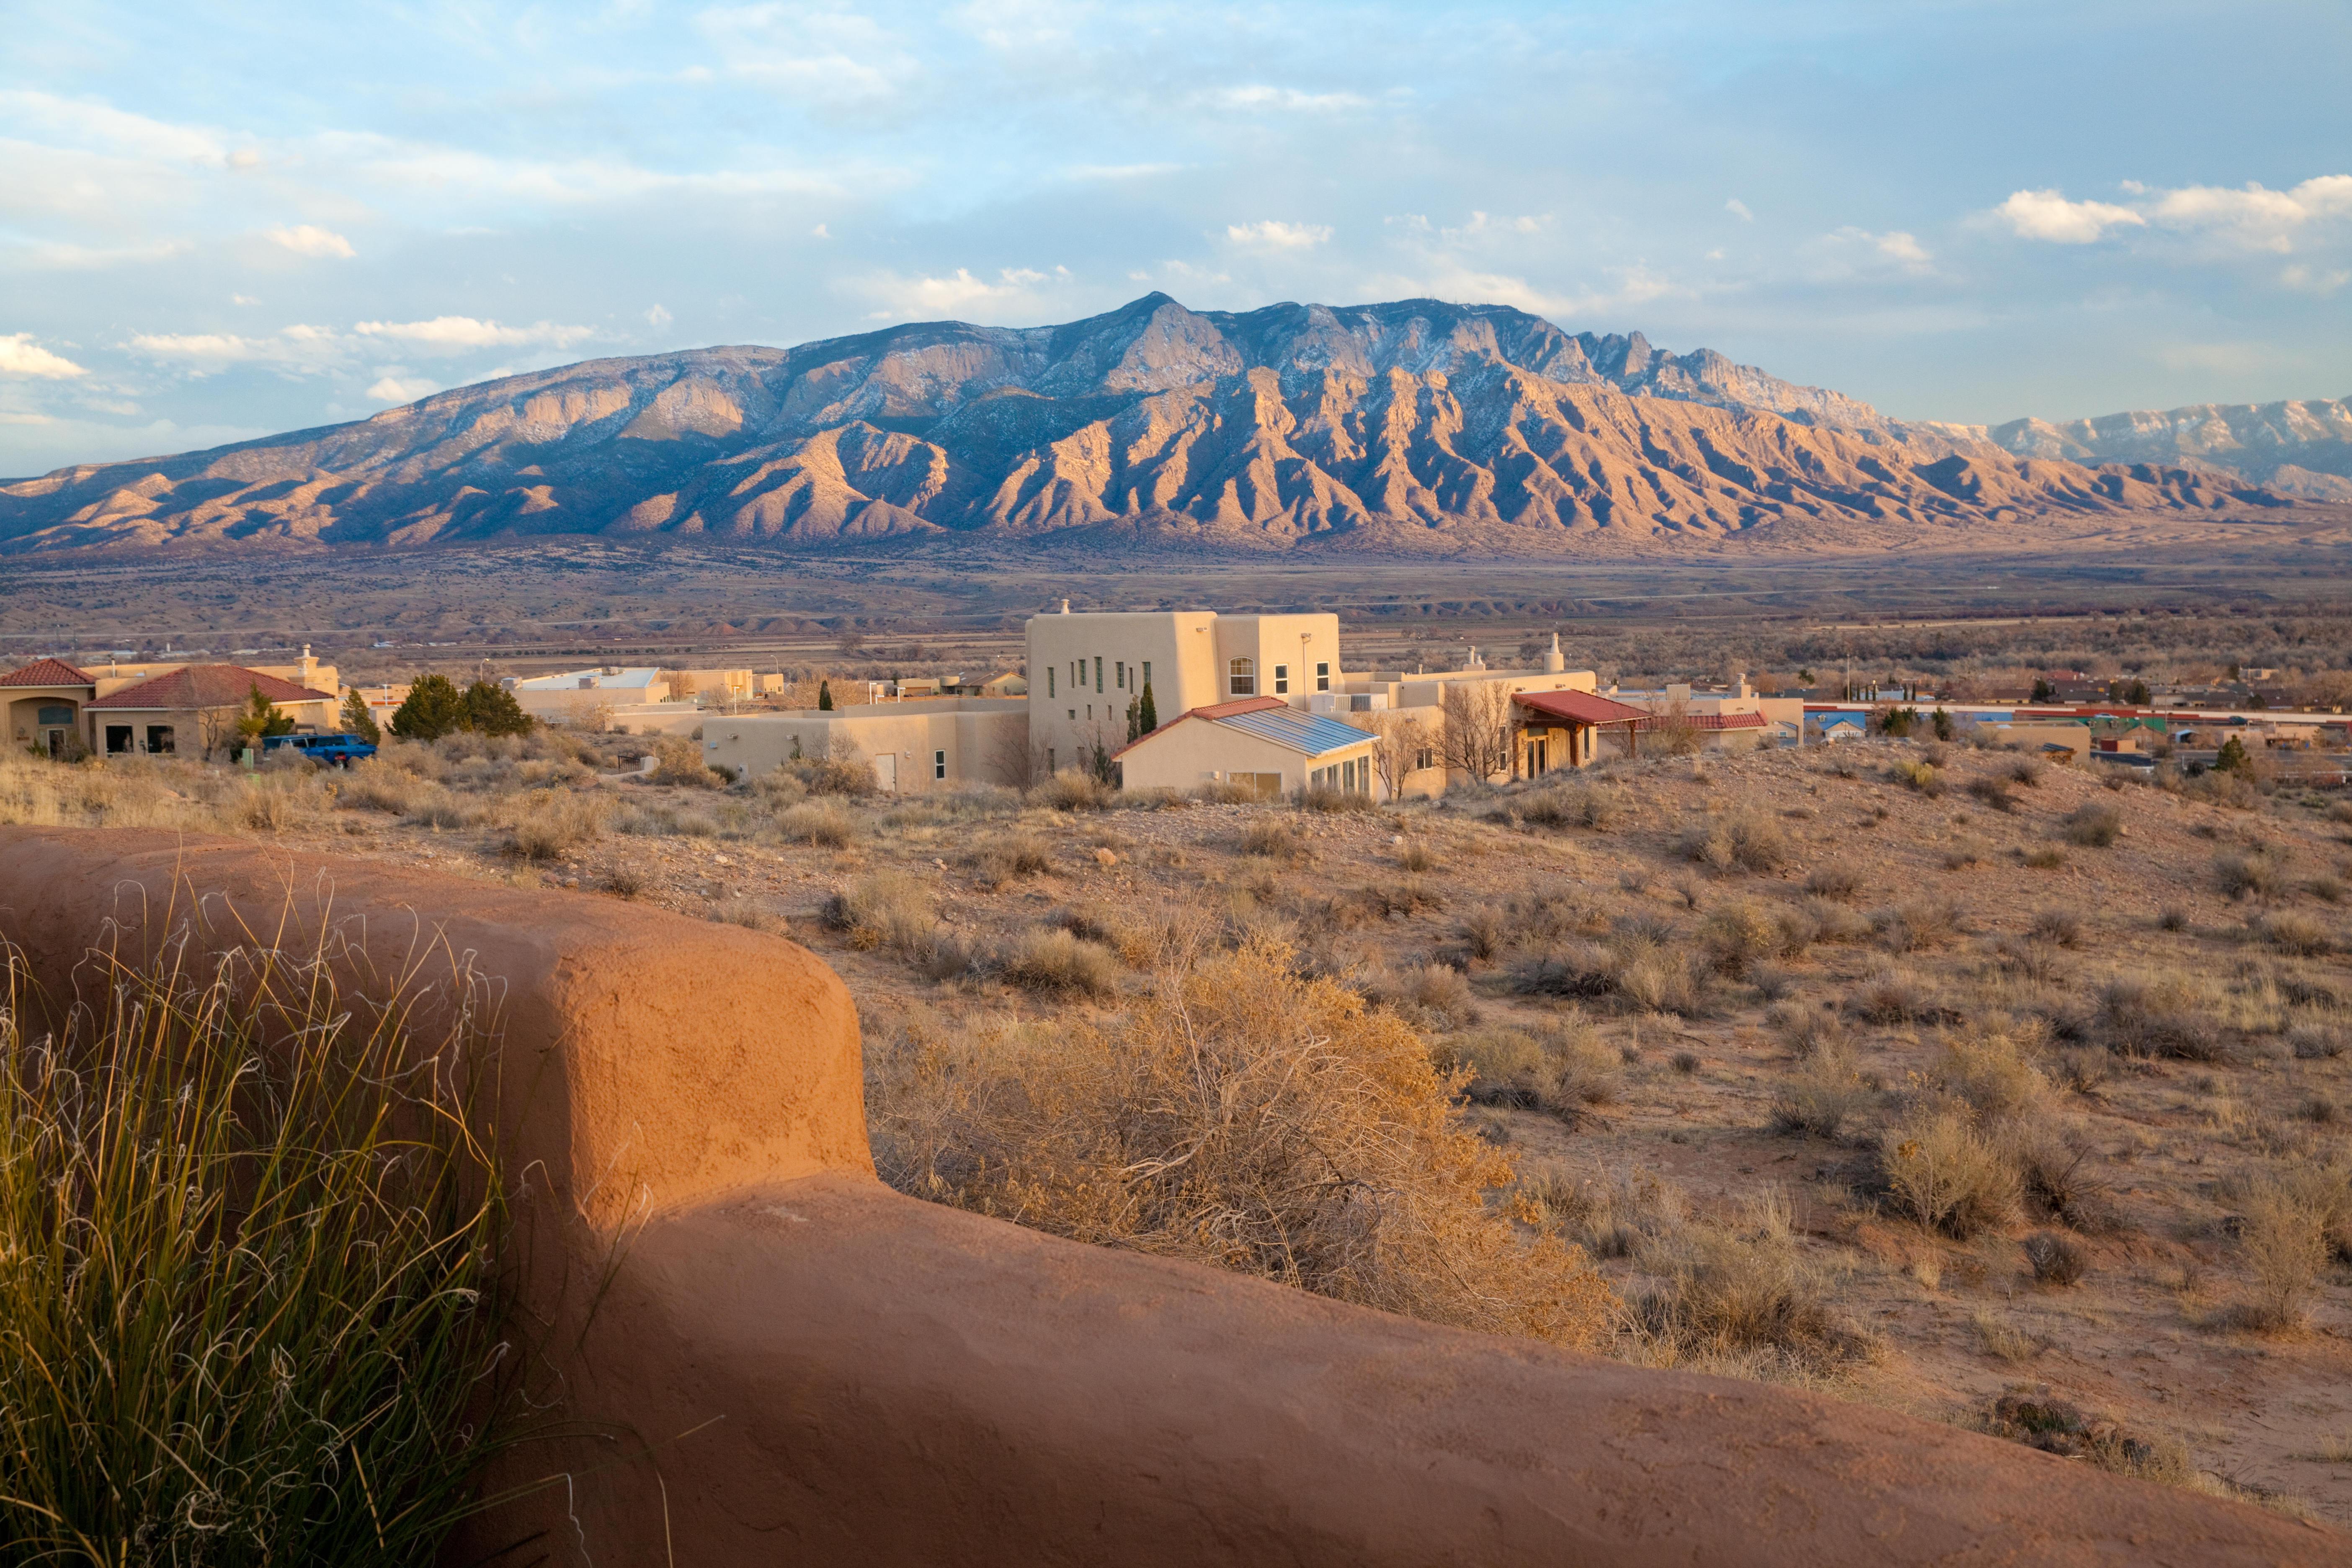 View of Sandia mountains, Albuquerque New Mexico.